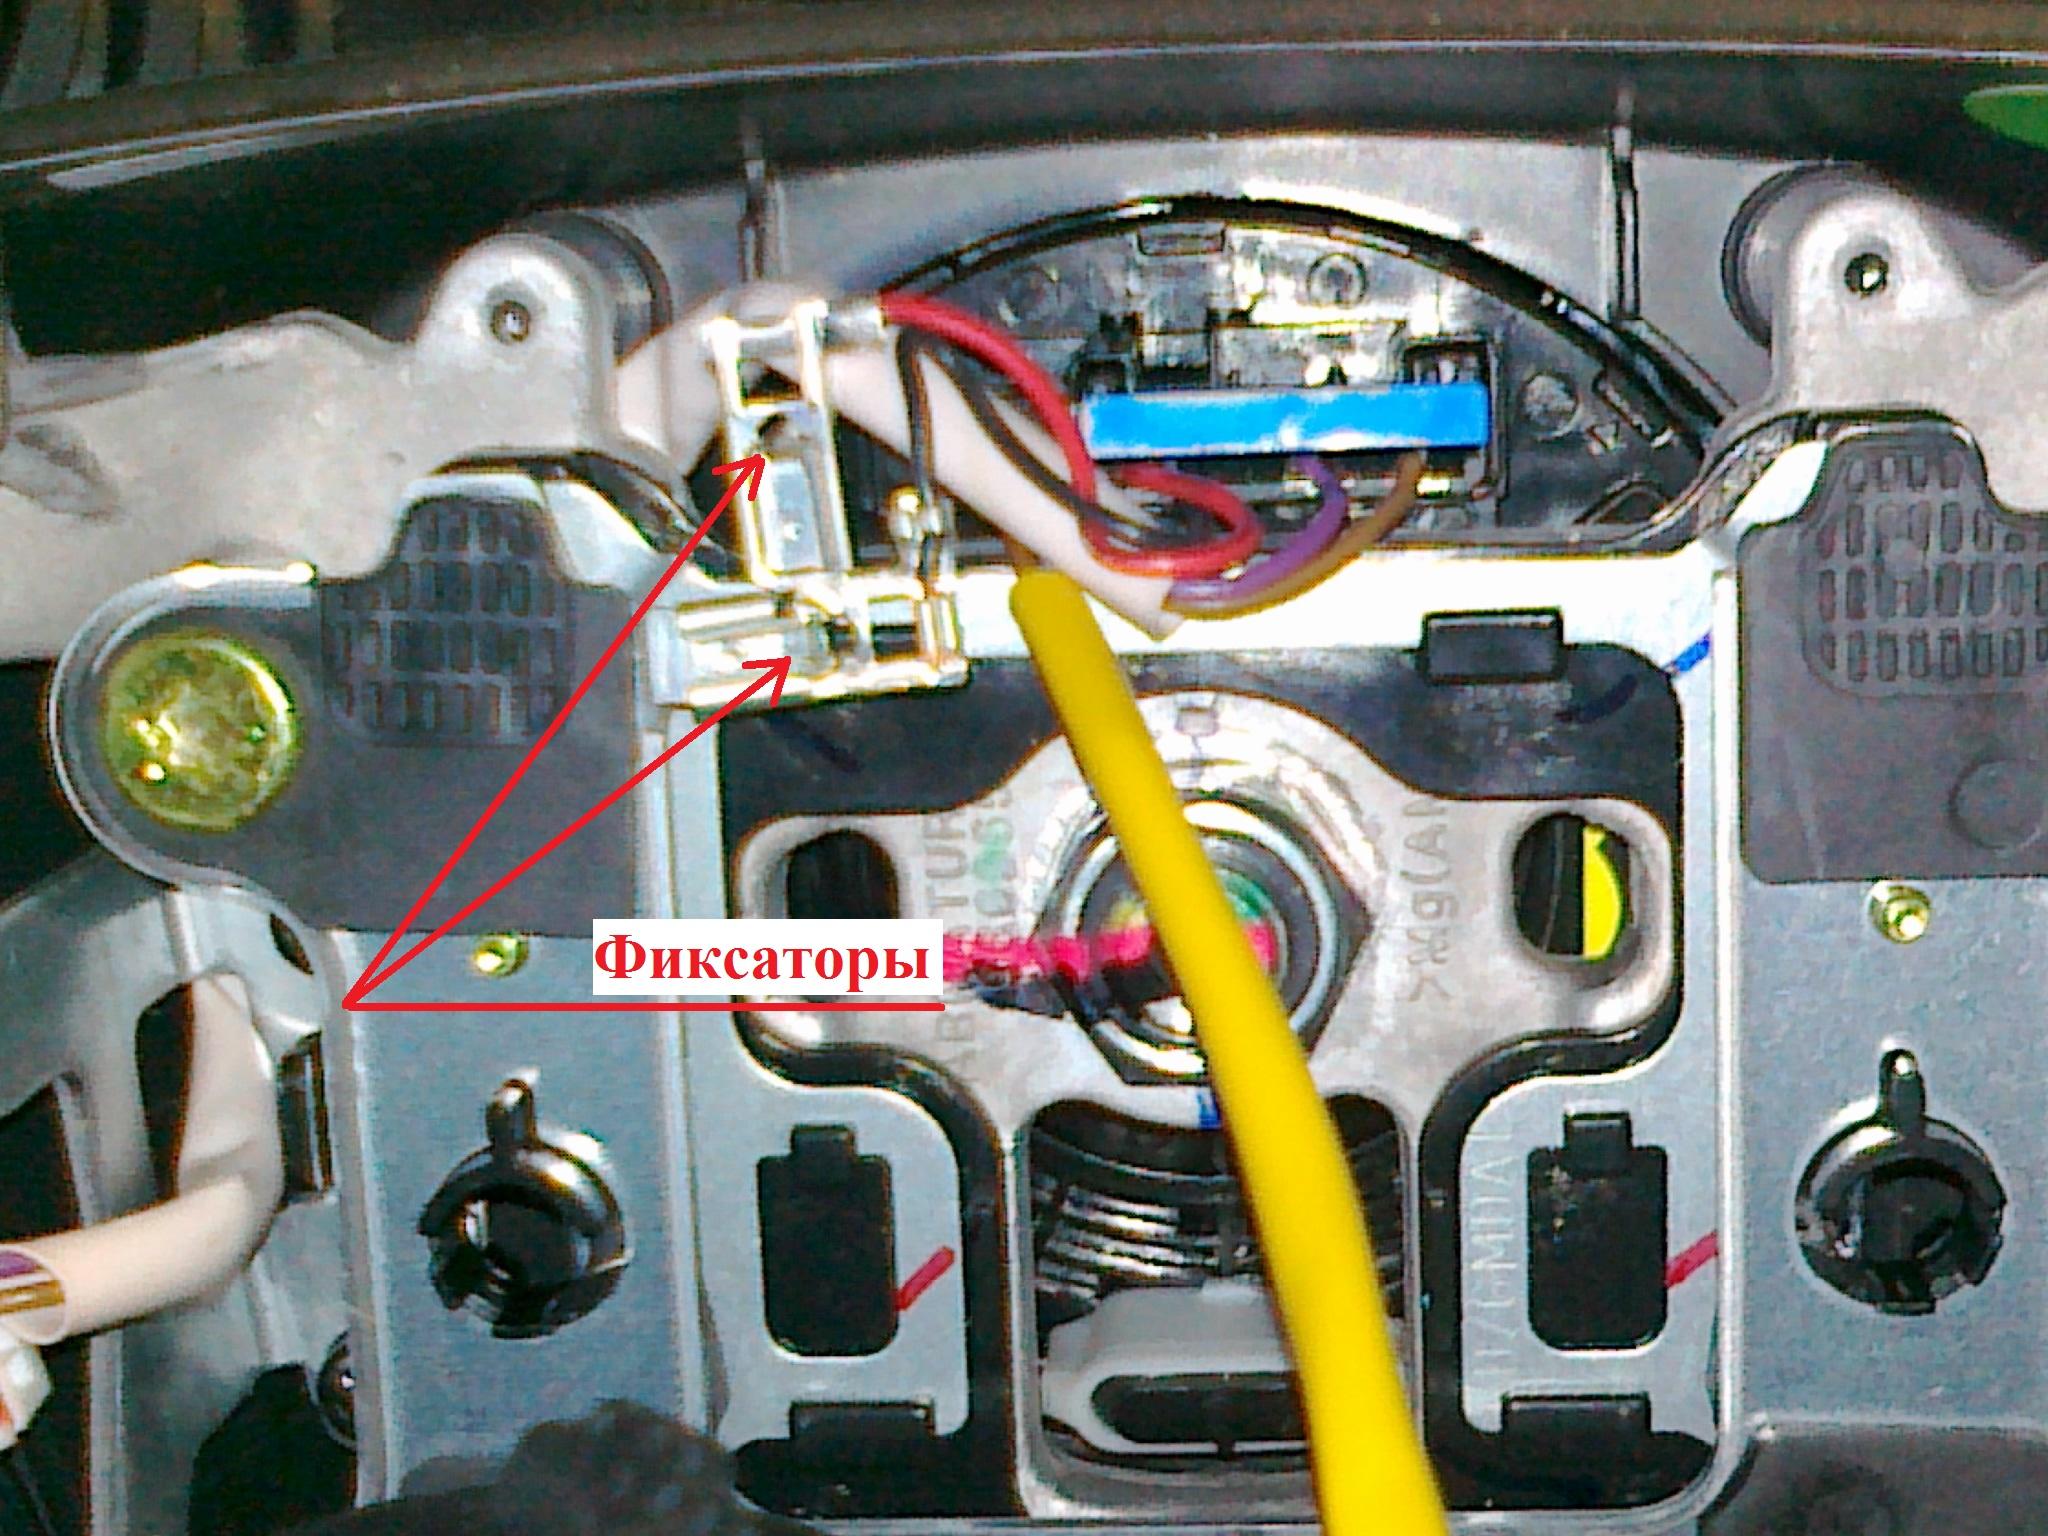 электронная схема ауди системы шеврале круз